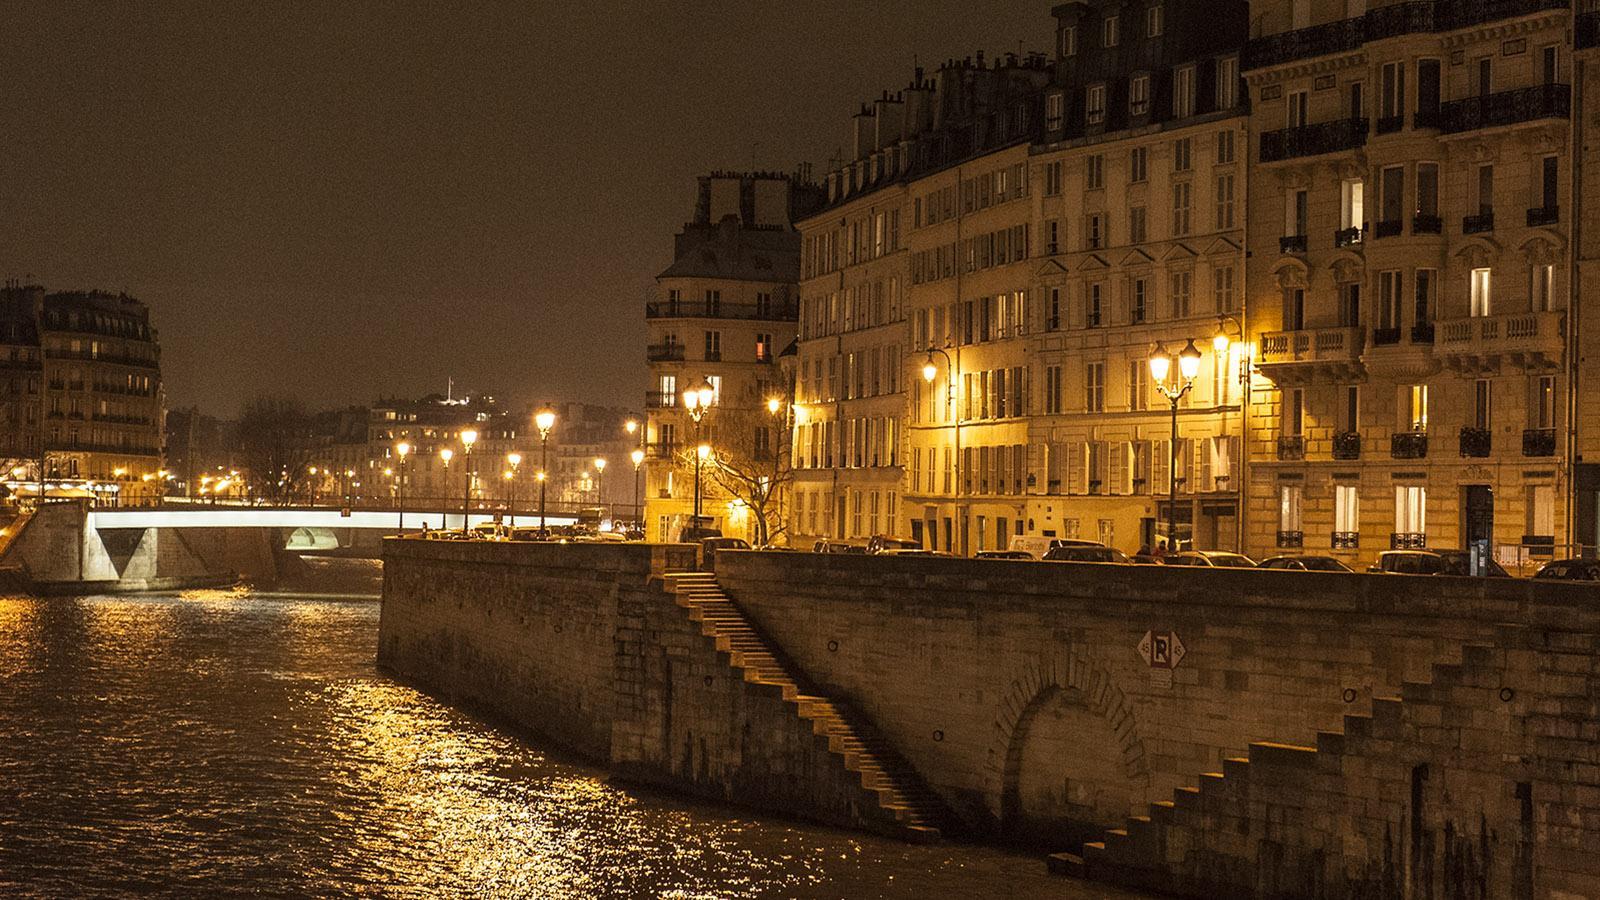 Ville lumière: Blick auf die Île Saint-Louis mit dem Seine-Kai. Foto: Hilke Maunder